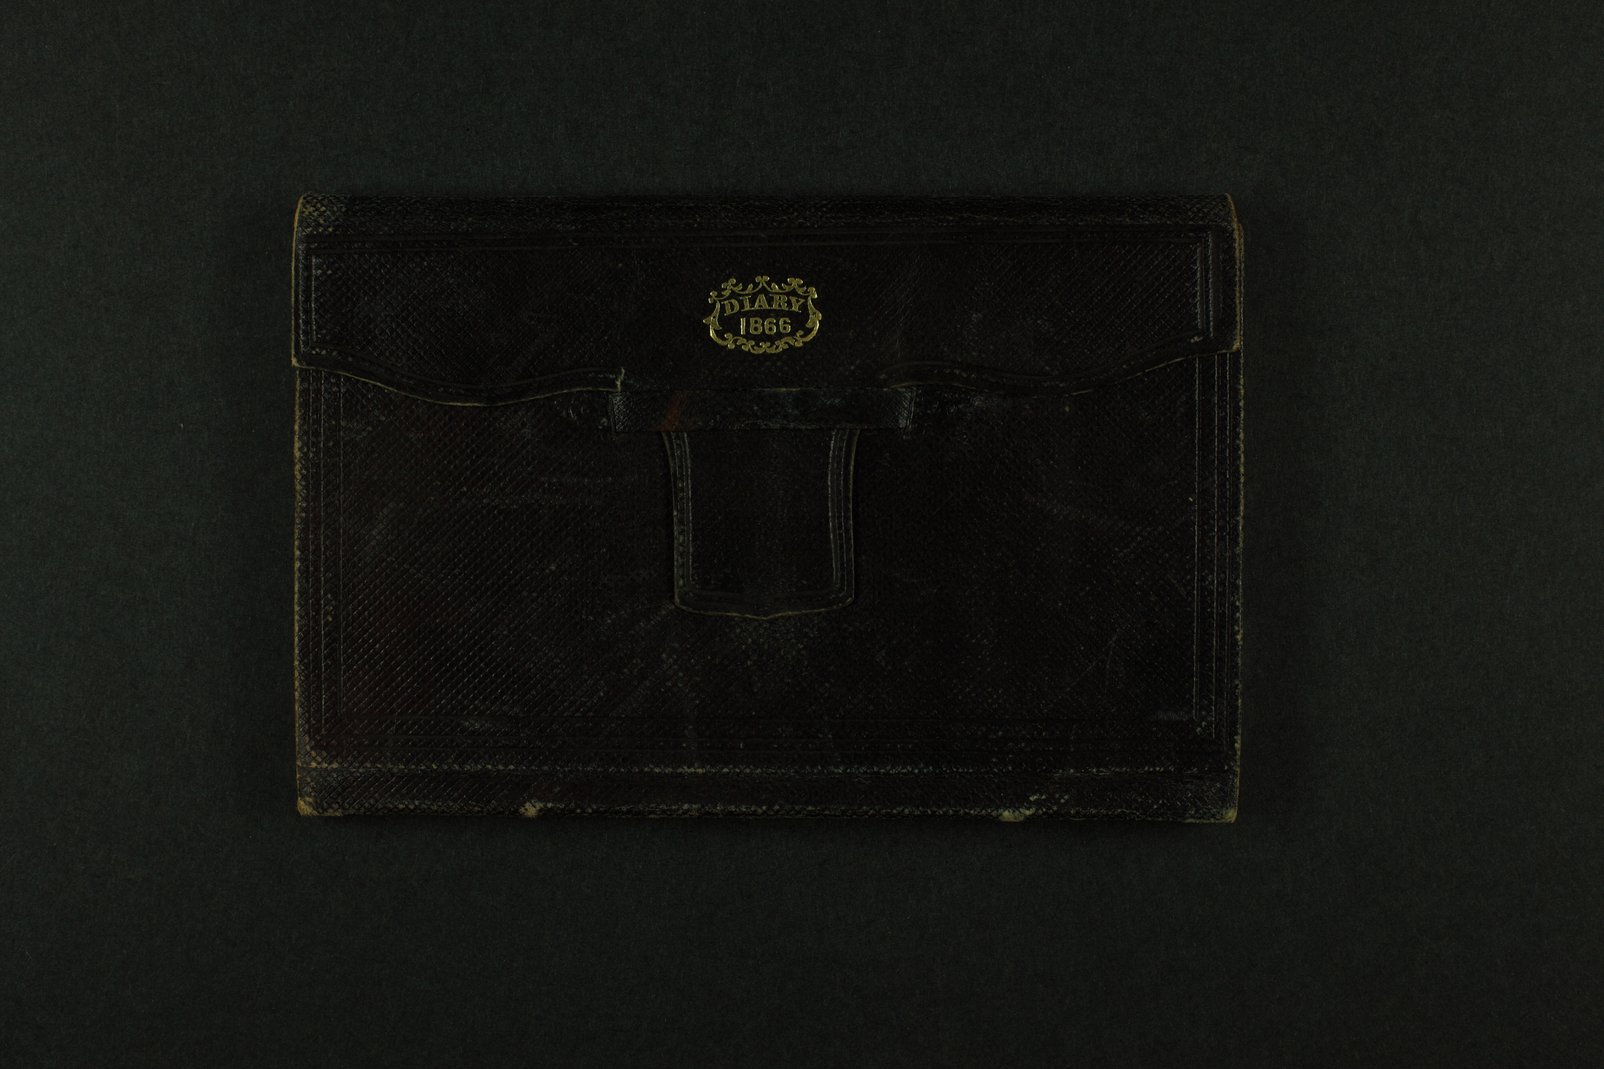 William E. Goodnow diary - 1  [Cover]